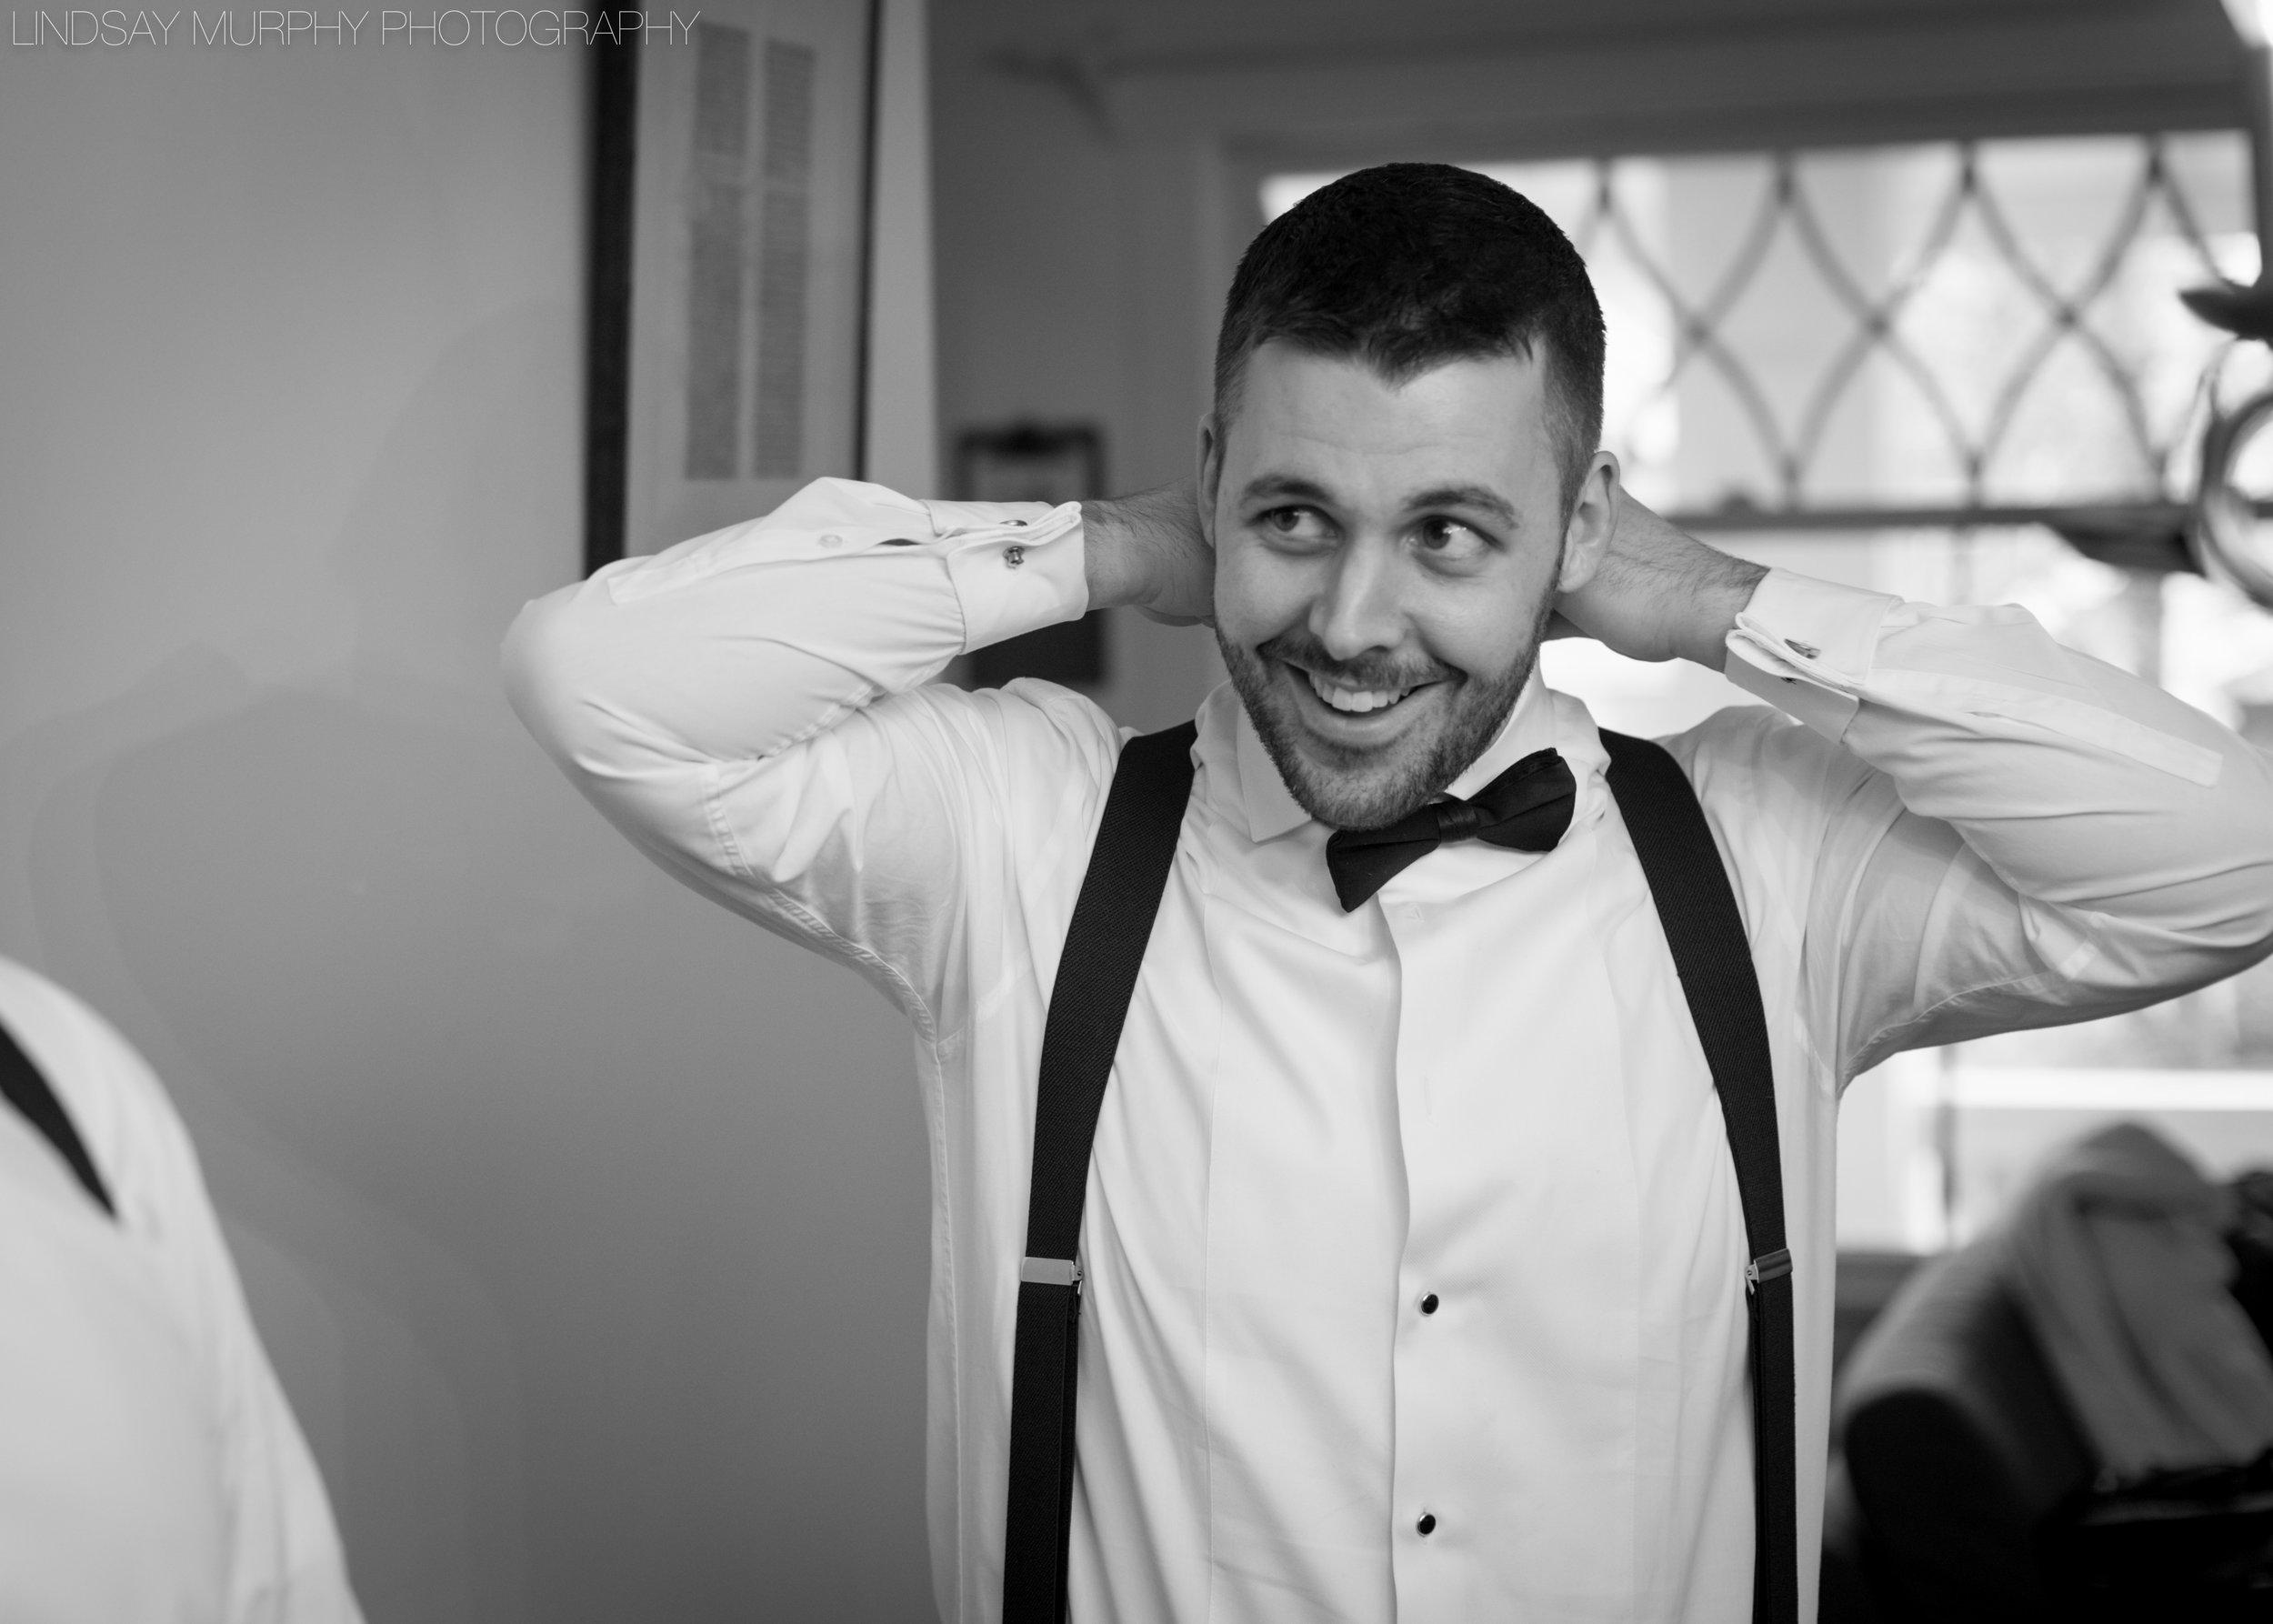 seattle_wedding_photography-42.jpg